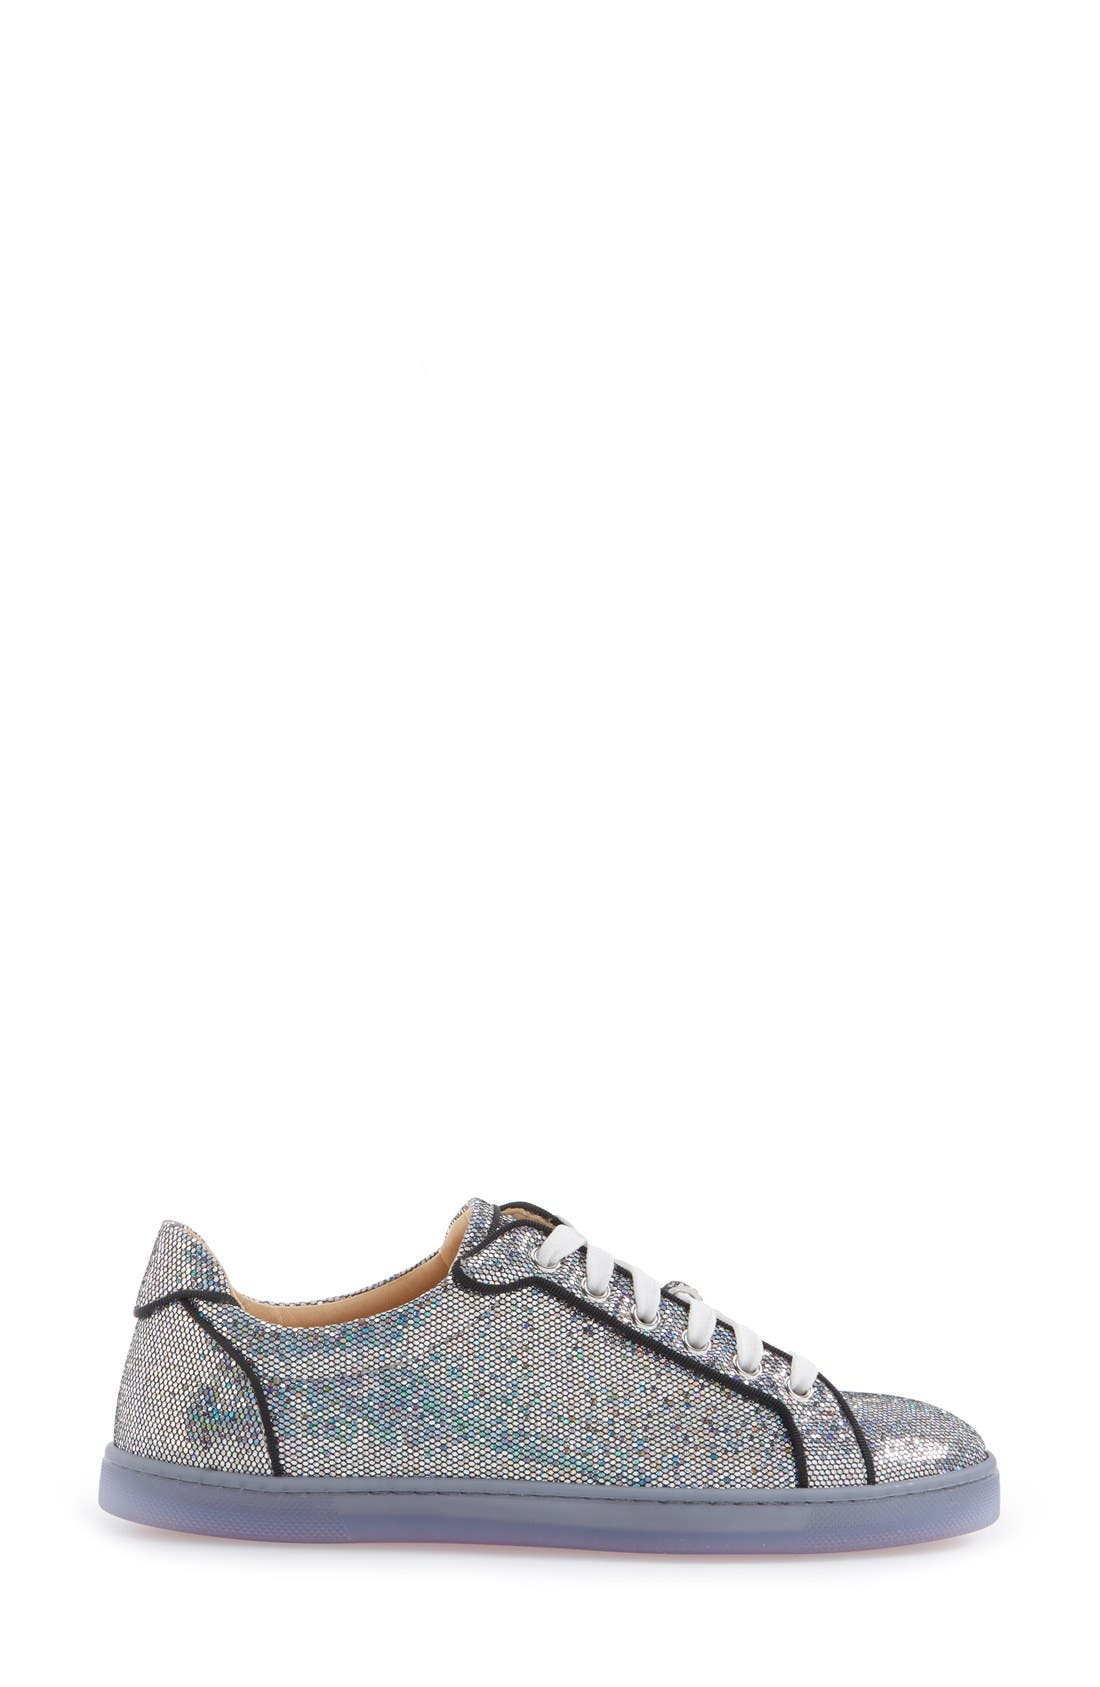 'Seava' Disco Ball Glitter Sneaker,                             Alternate thumbnail 4, color,                             040